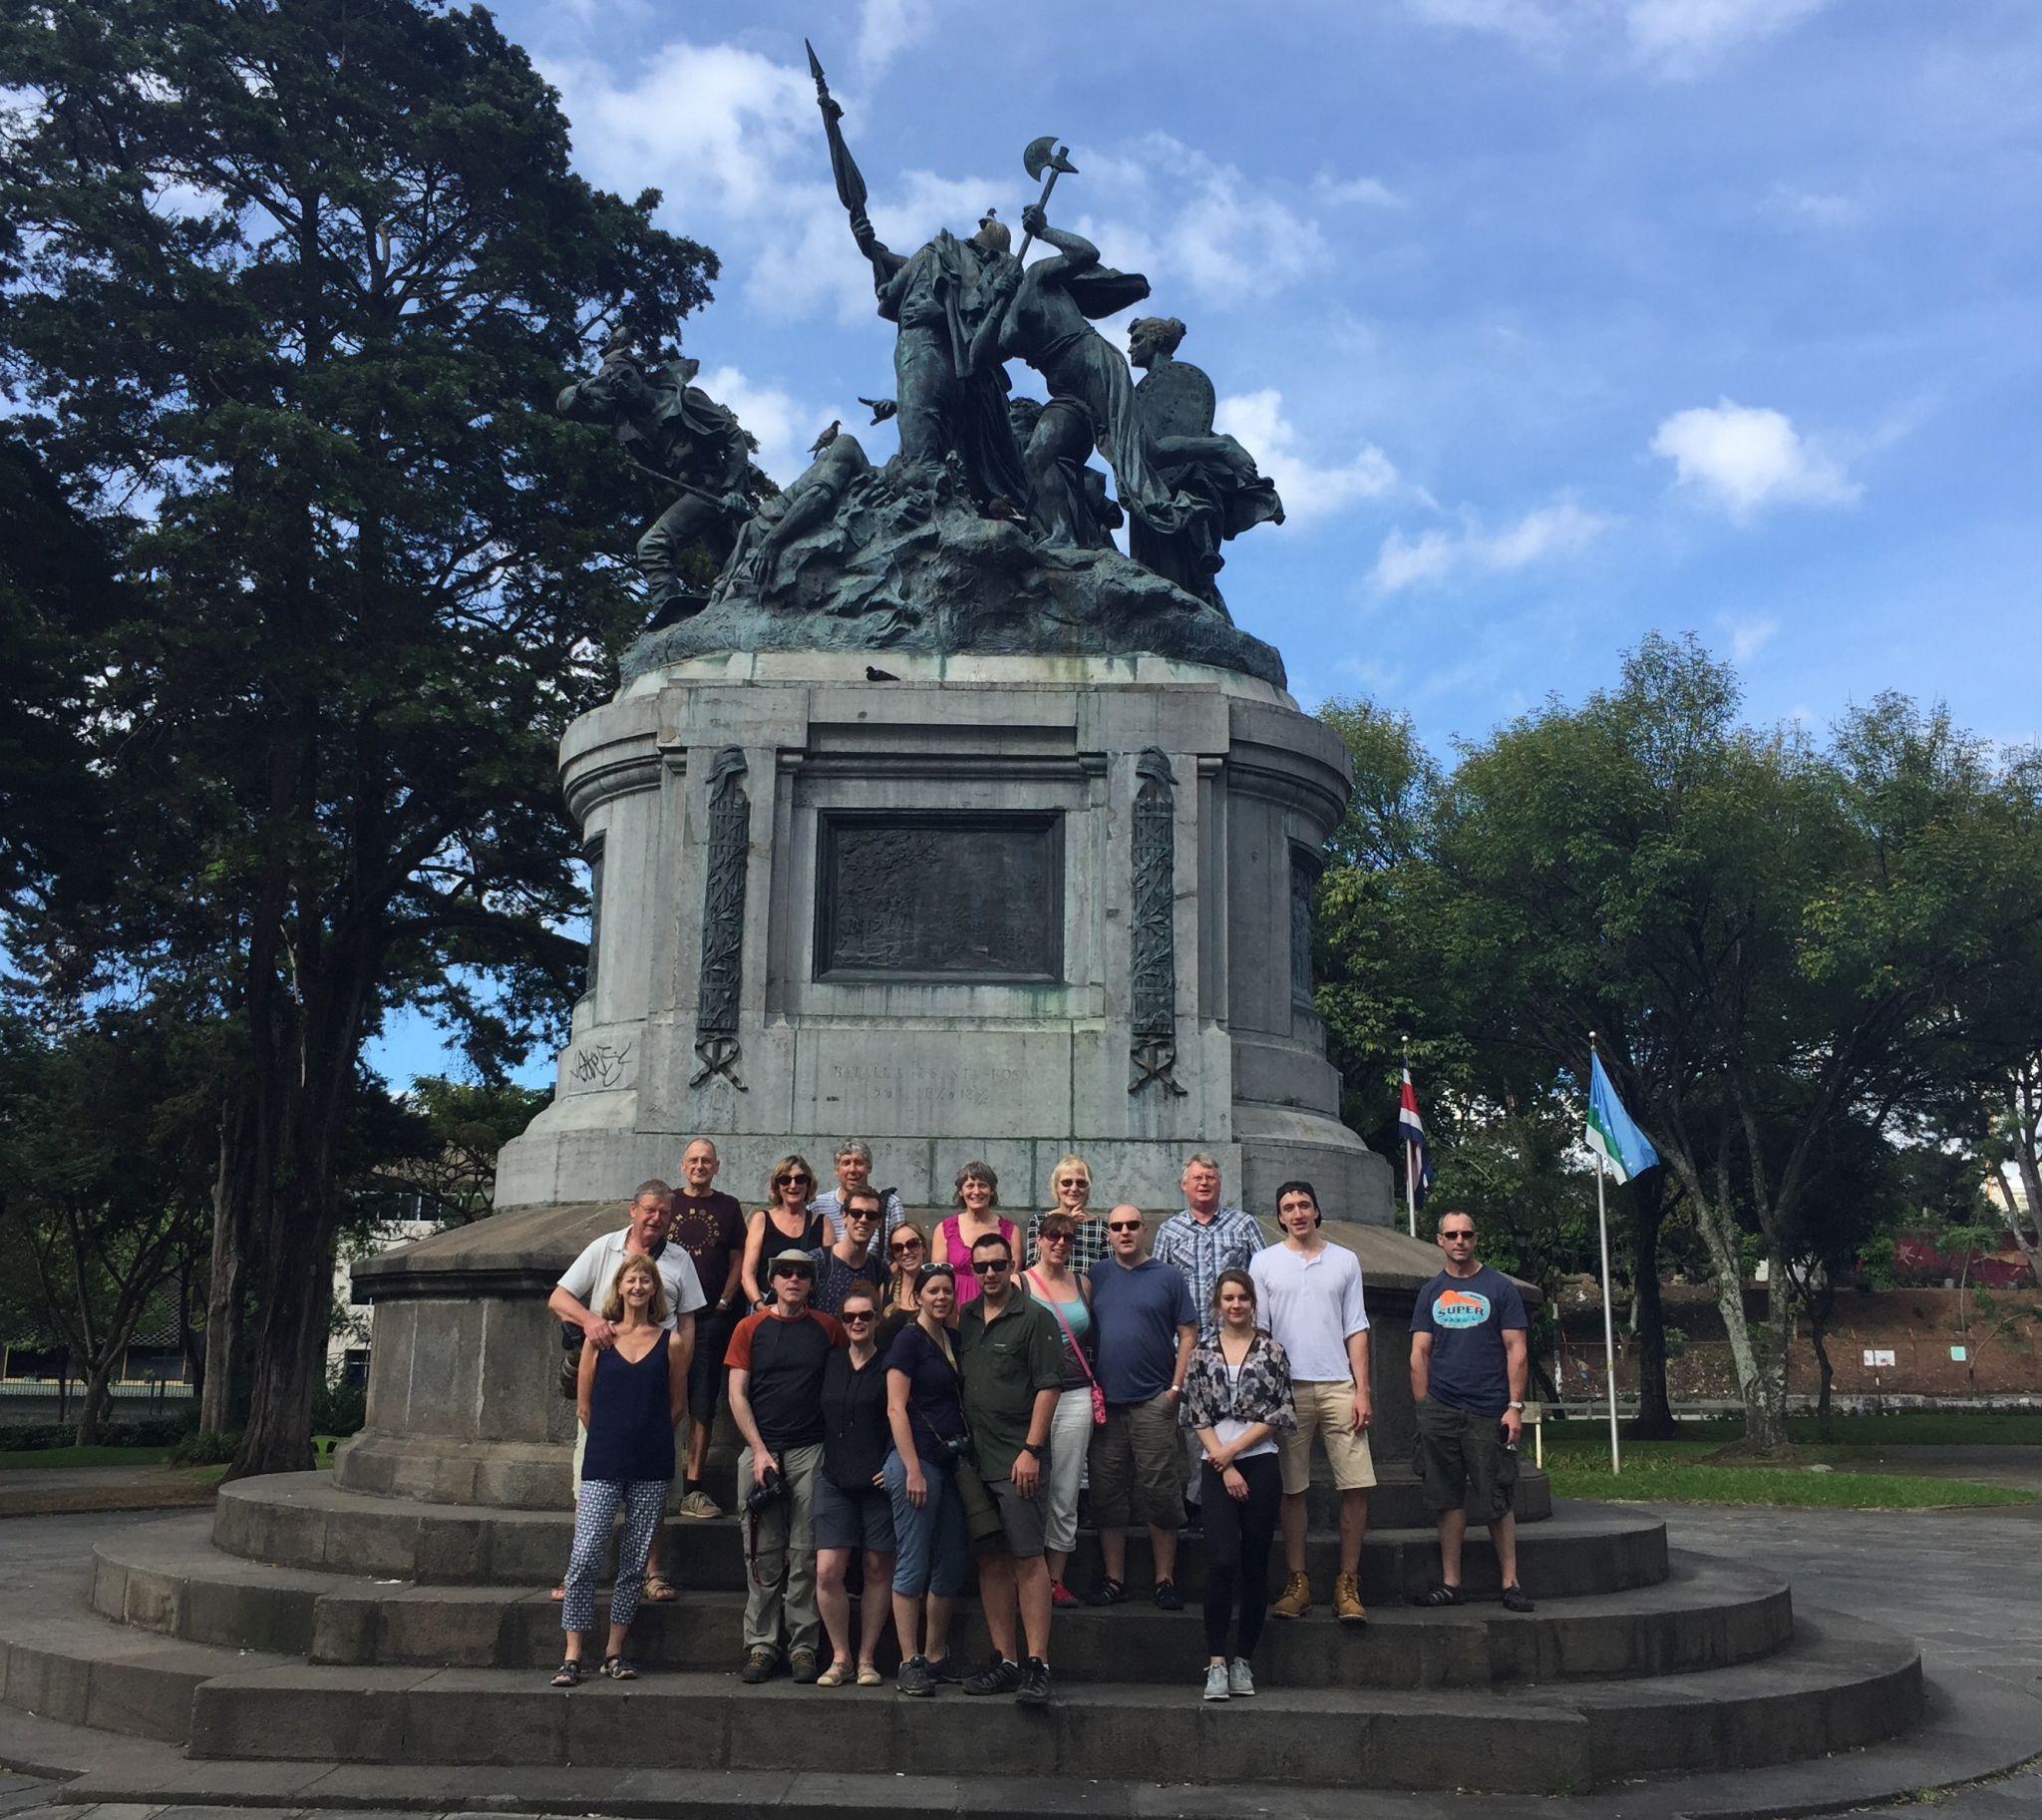 Costa Rica Travel Diaries: Do You Know the Way to San Jose? A Grand Tour group photo in Parque Nacional, San Jose